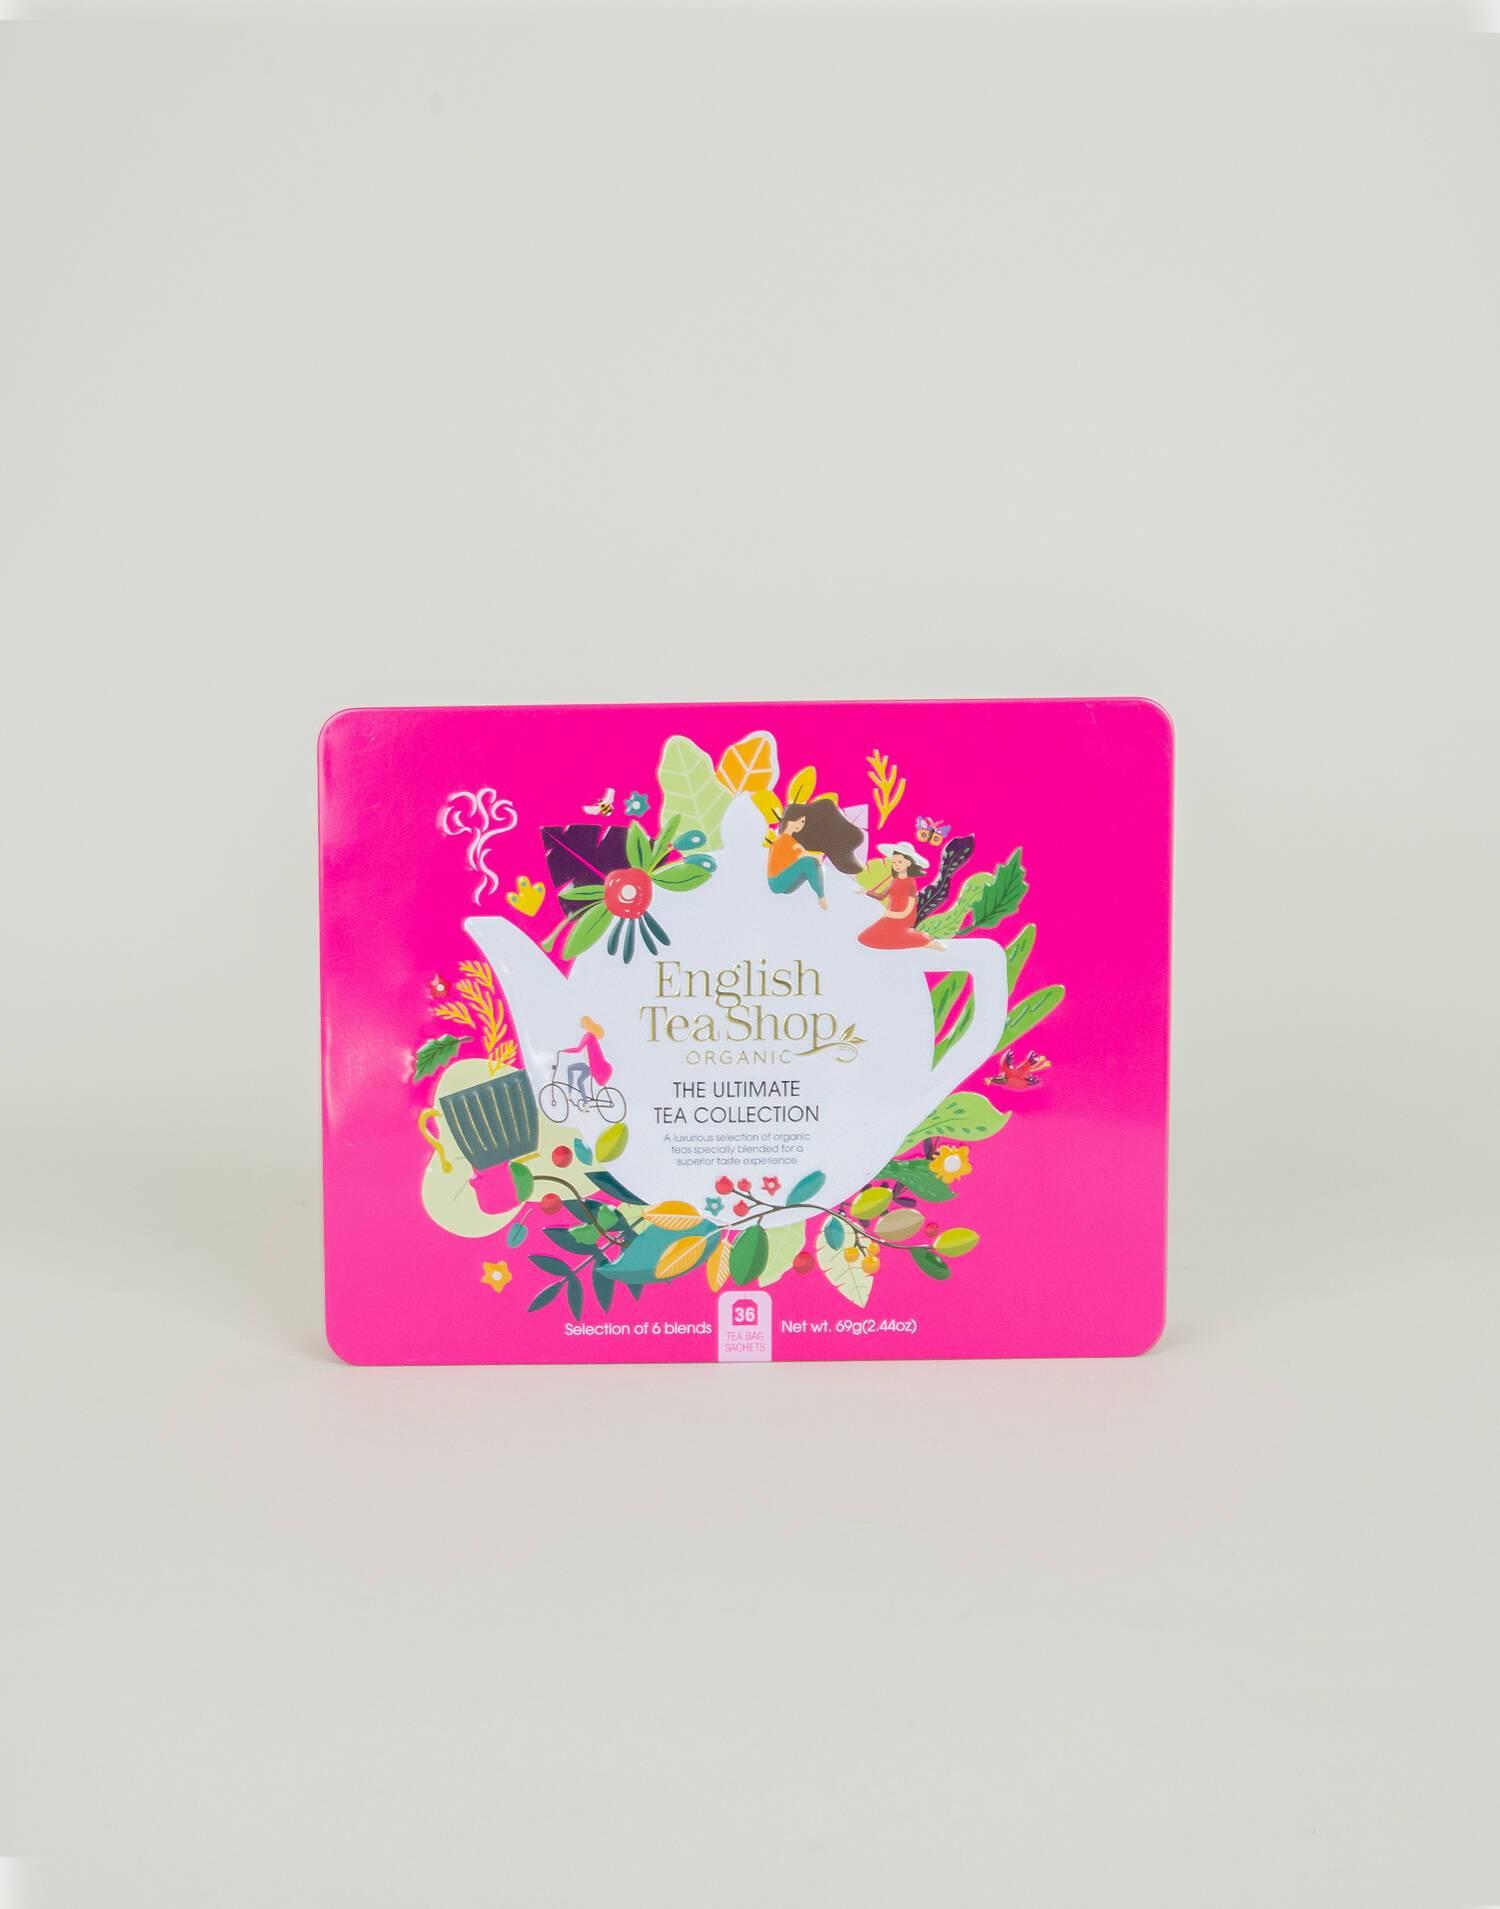 The ultimate tea collection - organic tea can